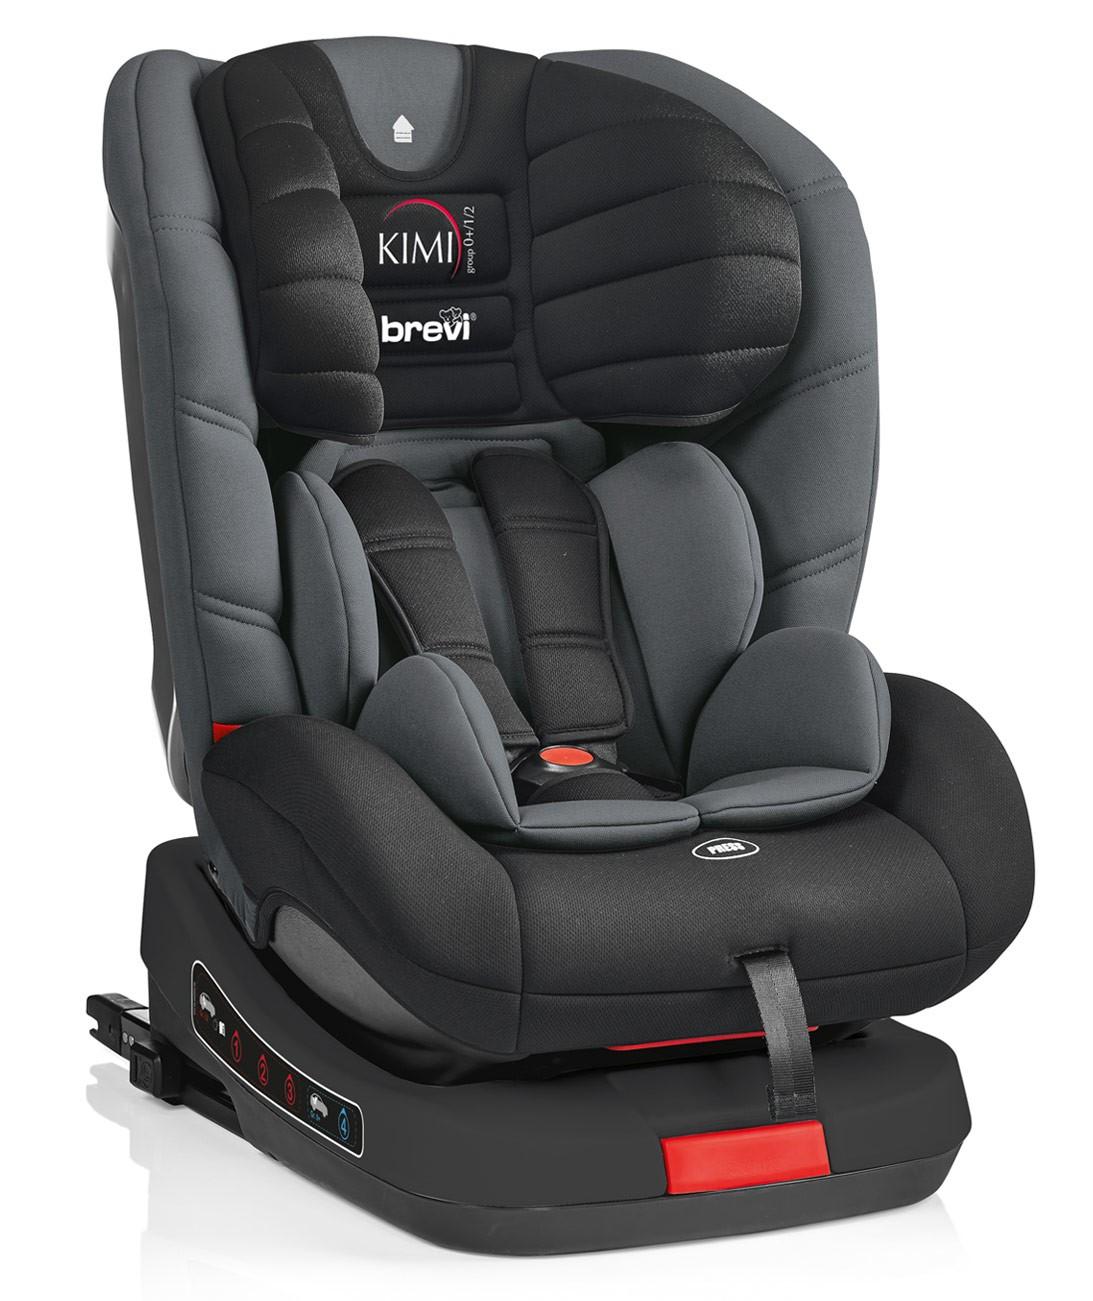 Brevi Kindersitz Kimi Isofix Schwarz